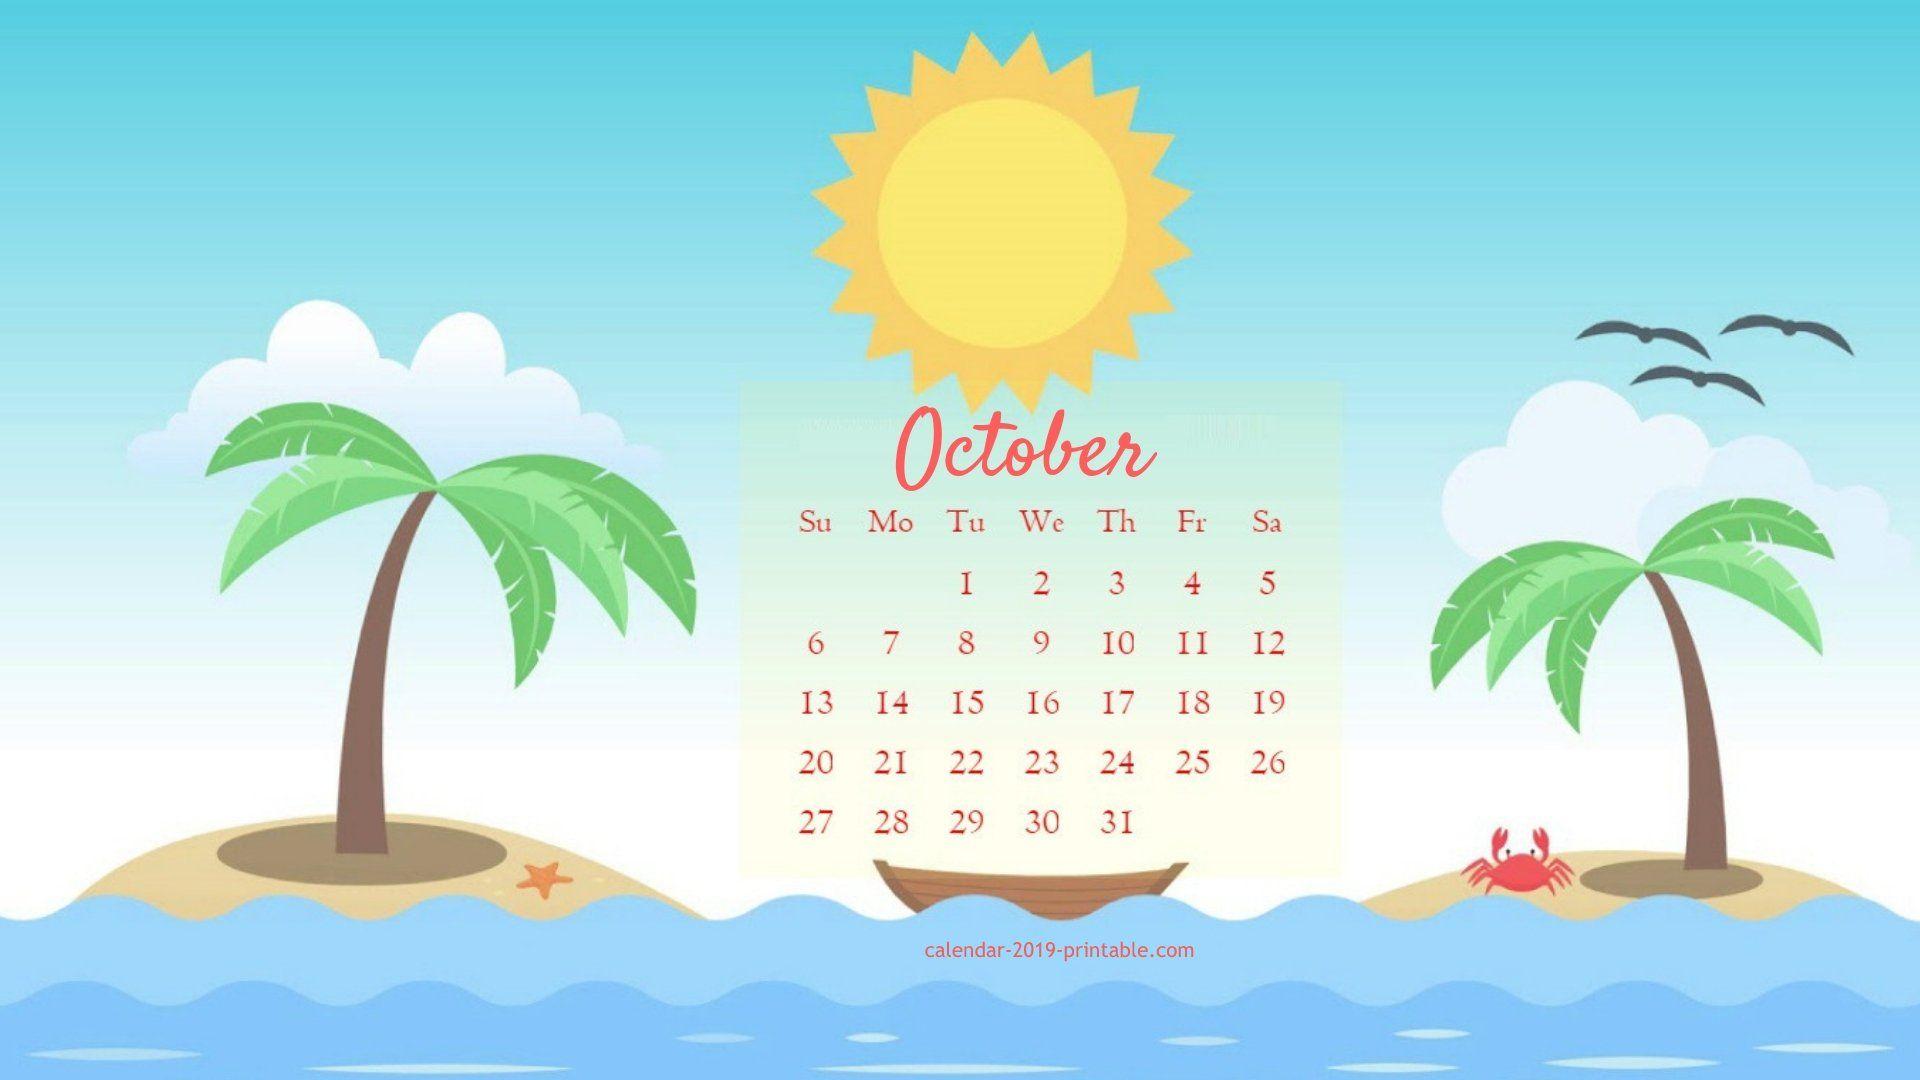 october 2019 cute calendar wallpaper Calendar wallpaper